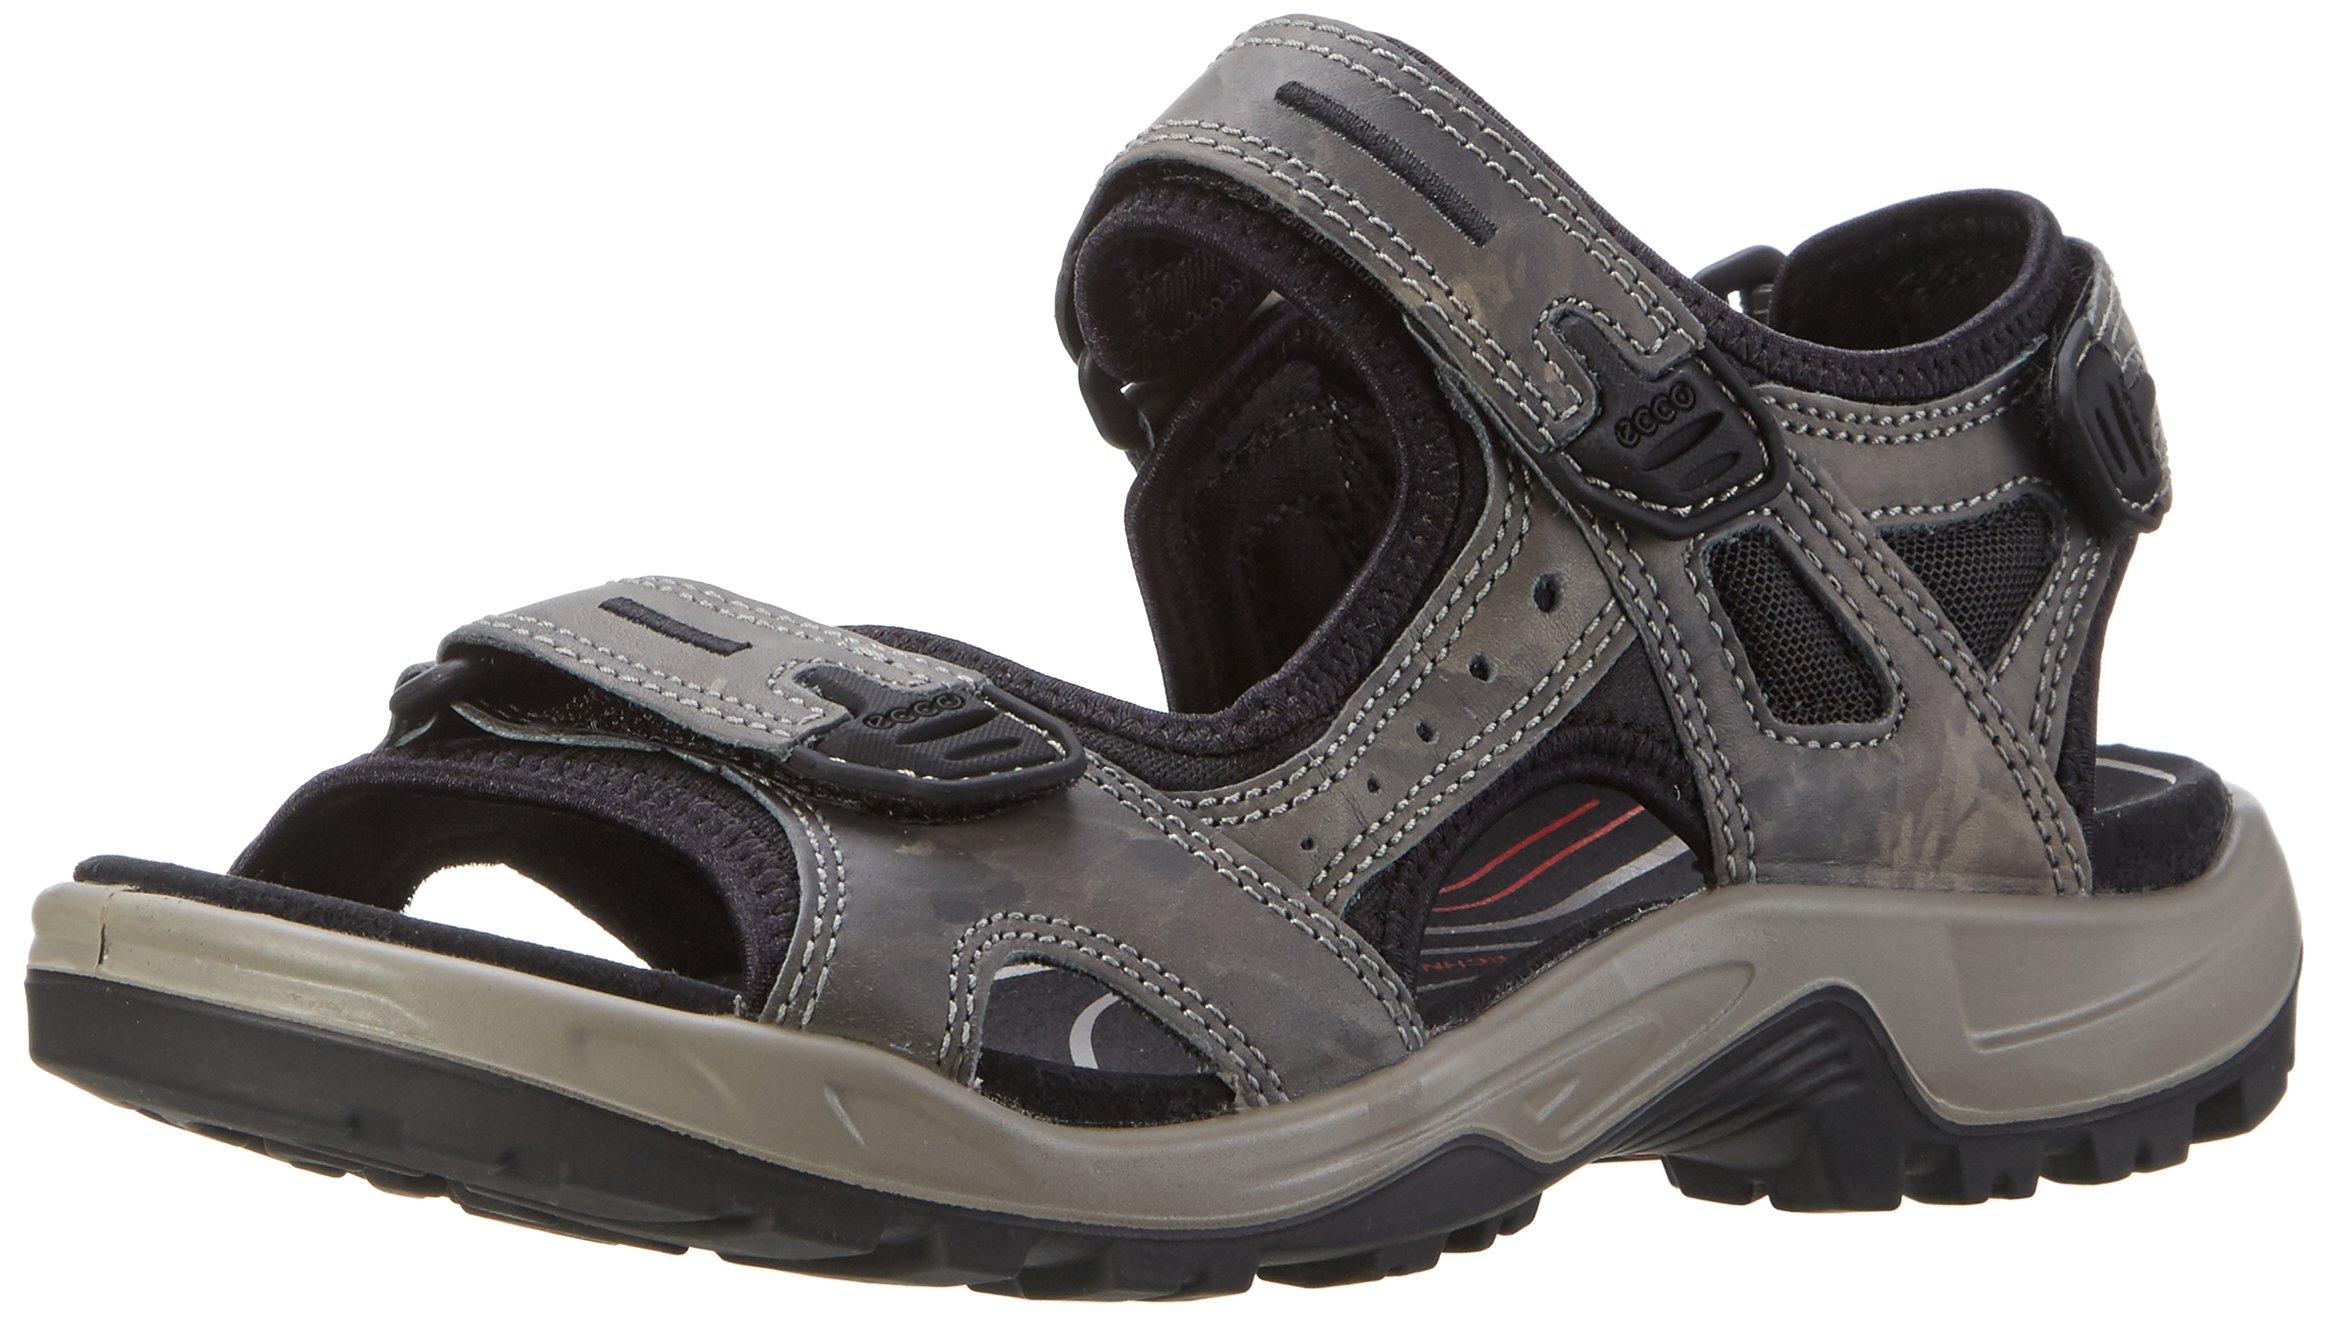 ECCO Men's Yucatan outdoor offroad hiking sandal, Tarmac, 46 EU (US Men's 12-12.5 M)